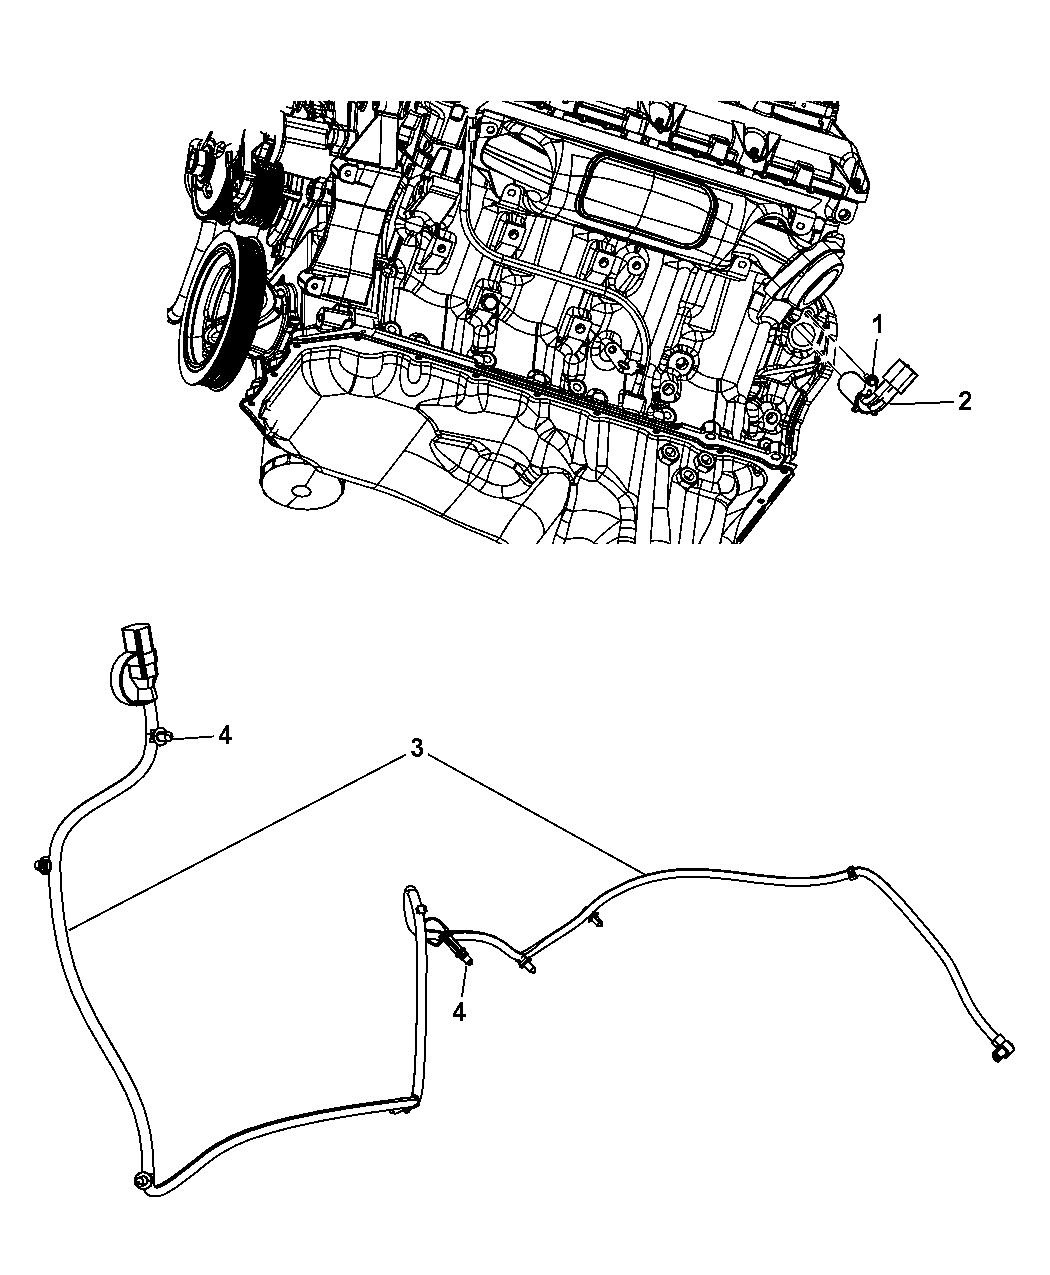 2010 dodge ram 1500 engine cylinder block heater - thumbnail 1